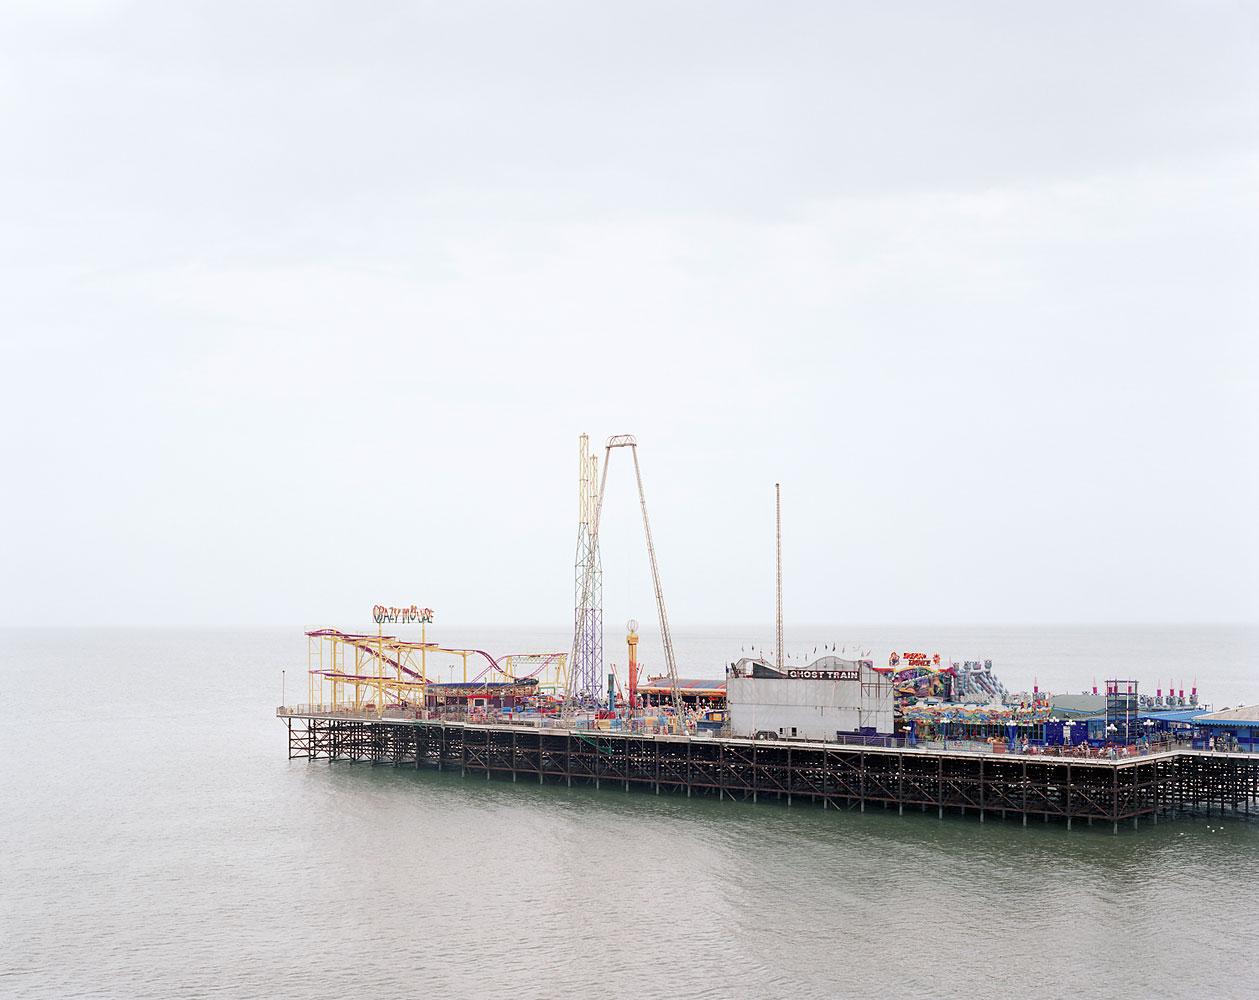 Blackpool South Pier, Lancashire, July 2008